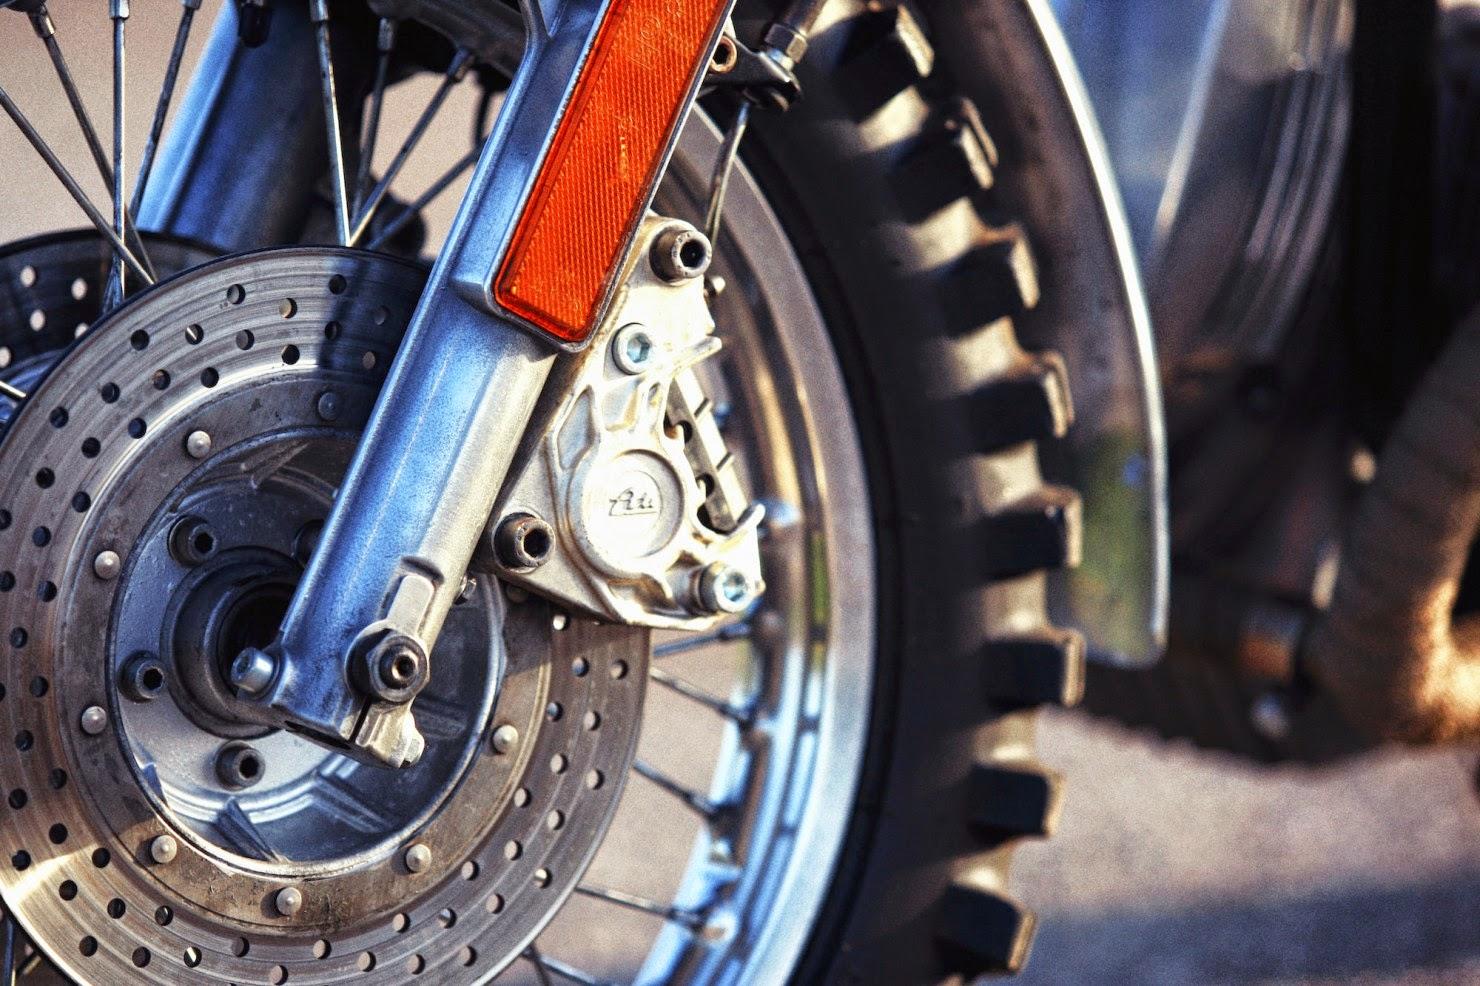 BMW-R45-Custom-Motorcycle-14-1480x986